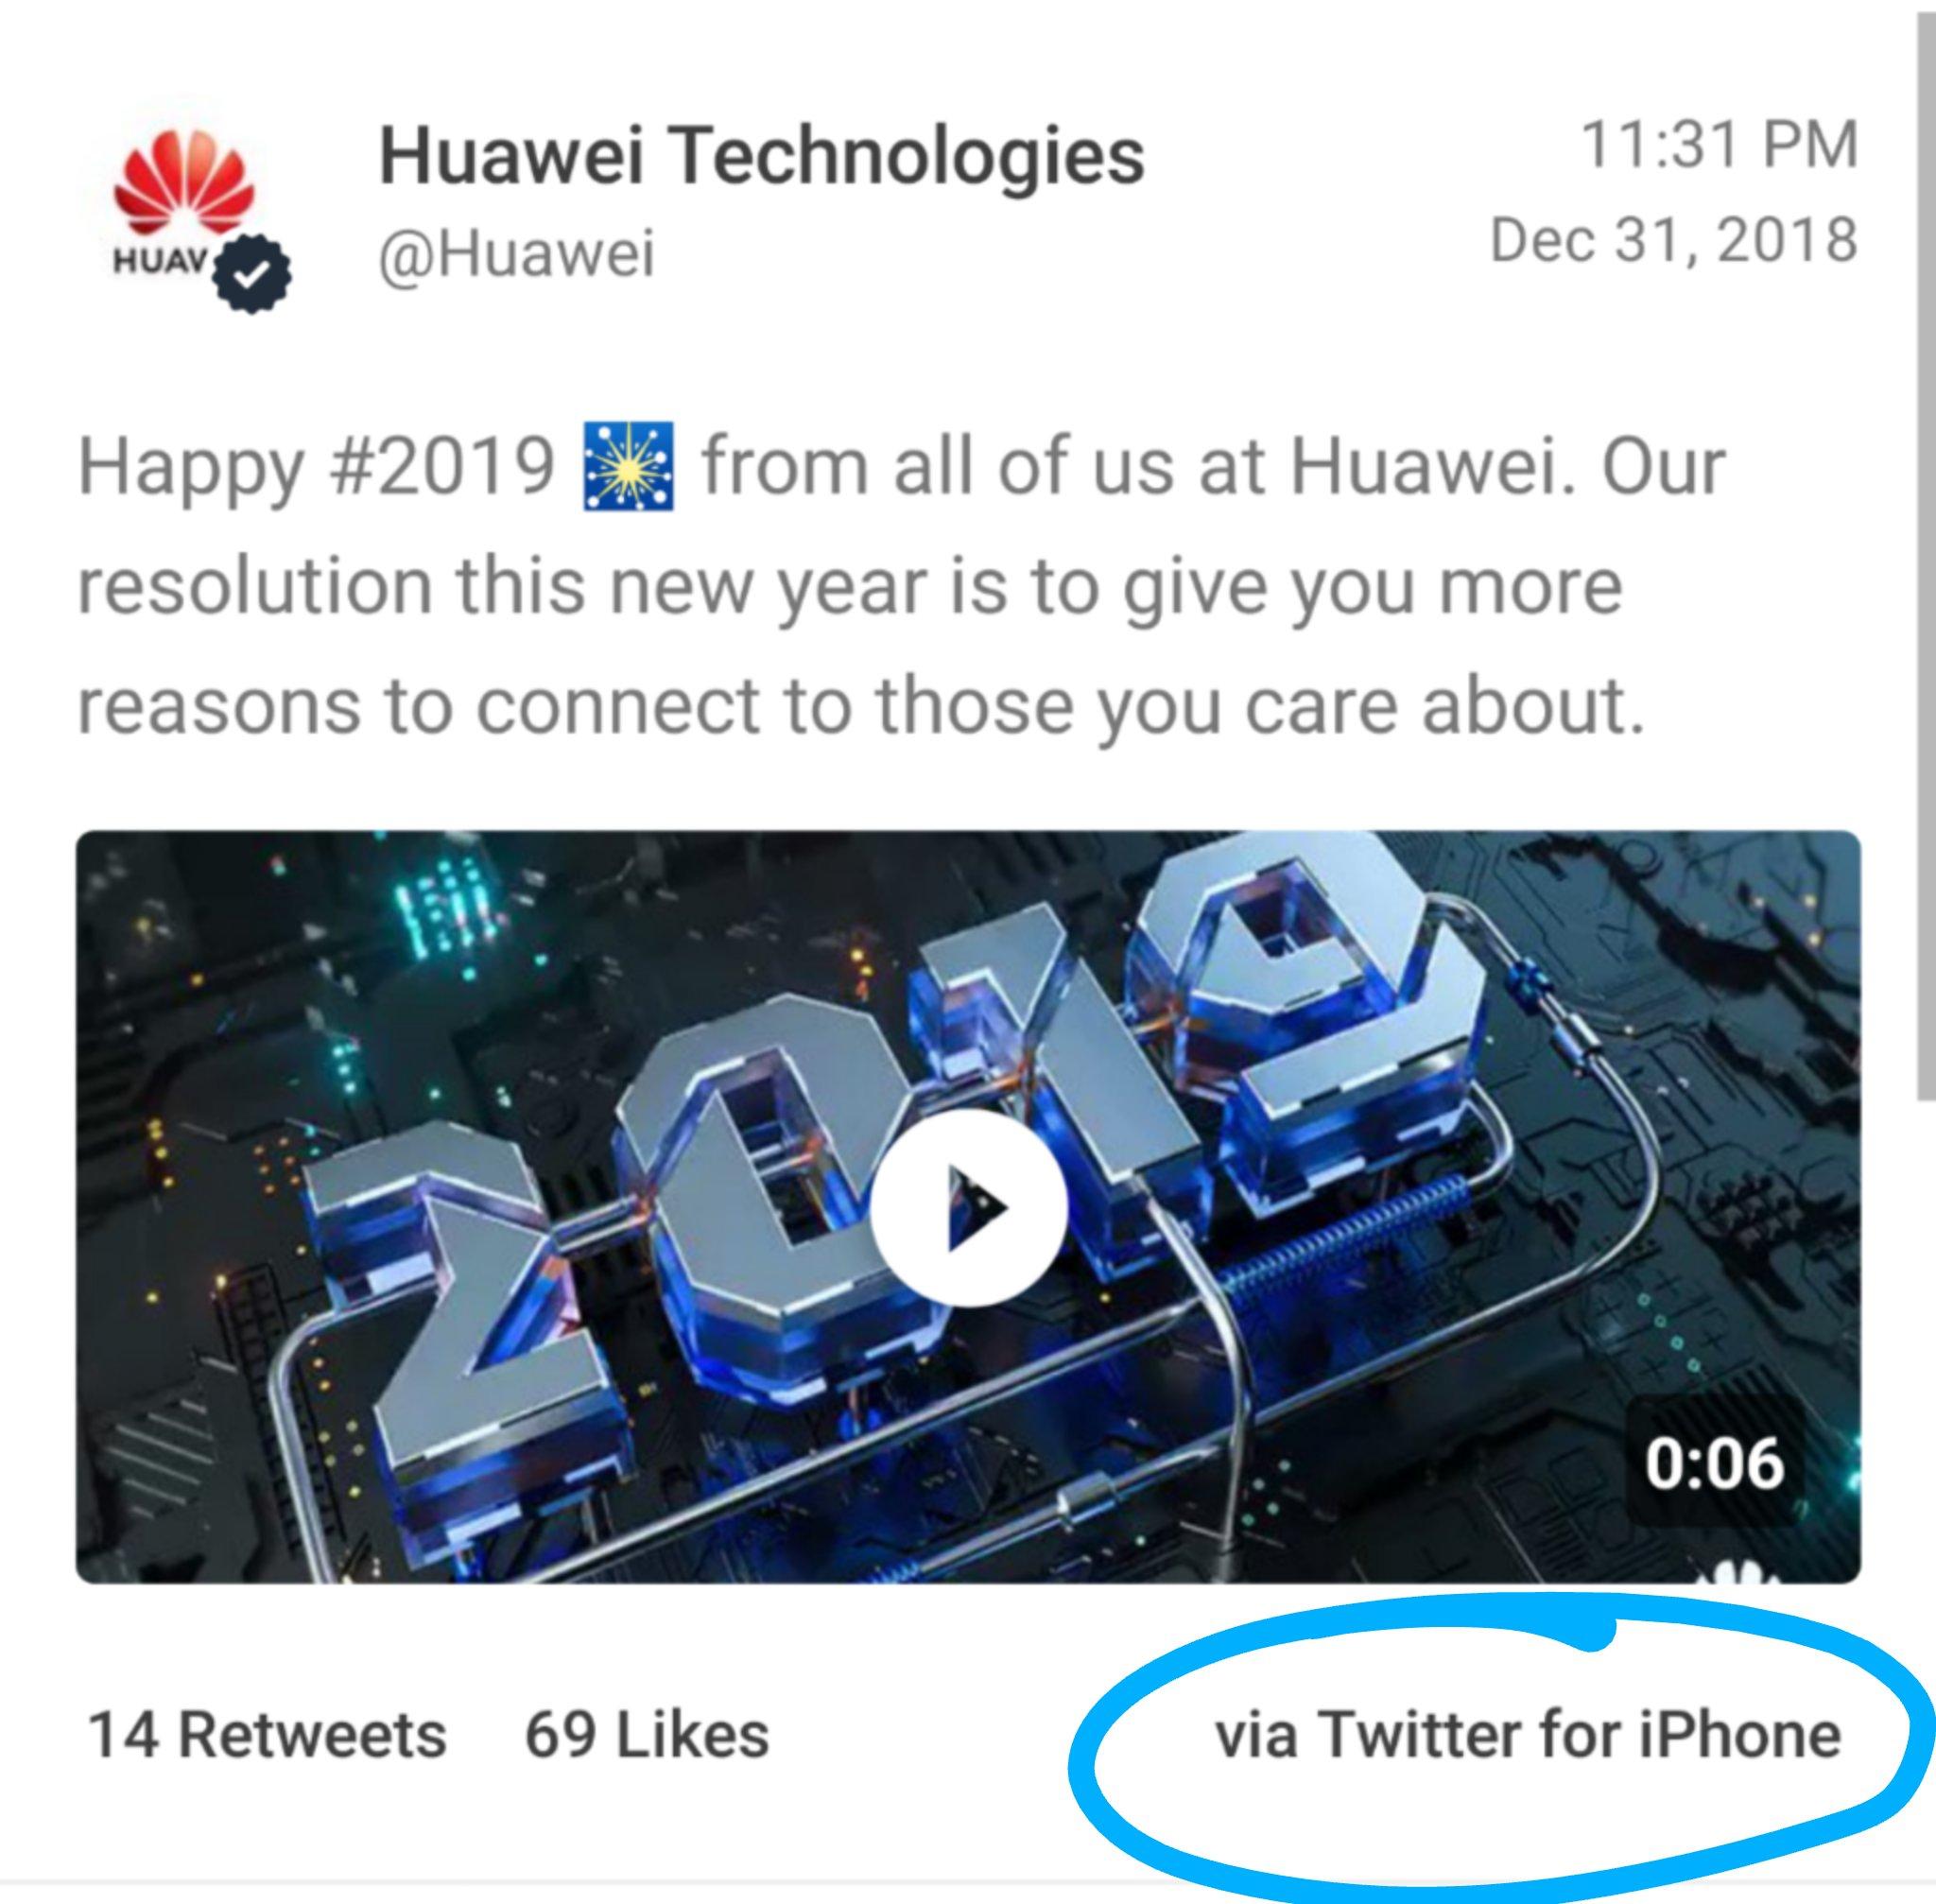 Huawei marketing